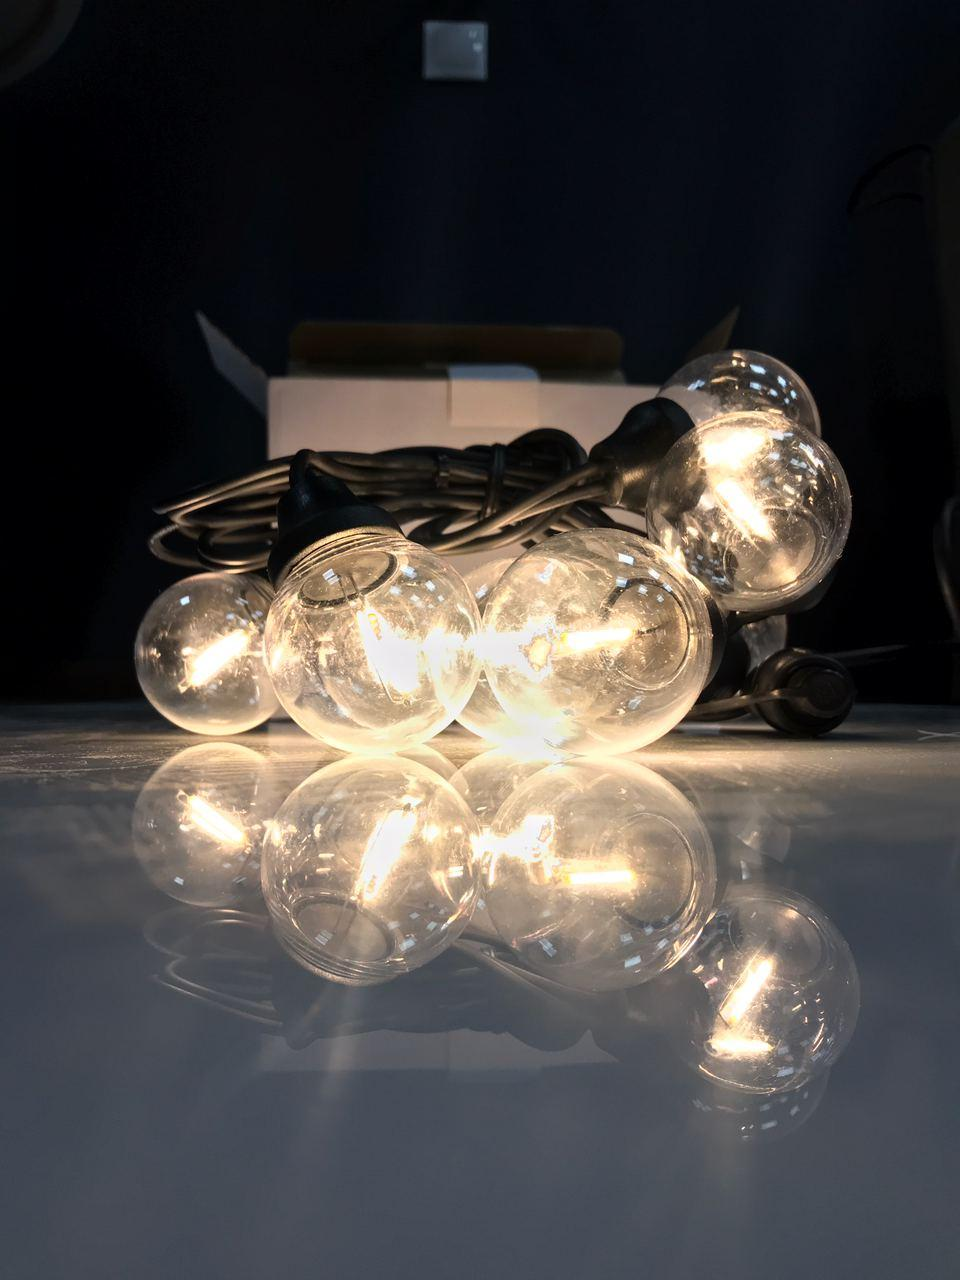 Cветодиодная ретро-гирлянда лампочки Lumion Filament Bulb String G45 4м 20 ламп цвет белый теплый